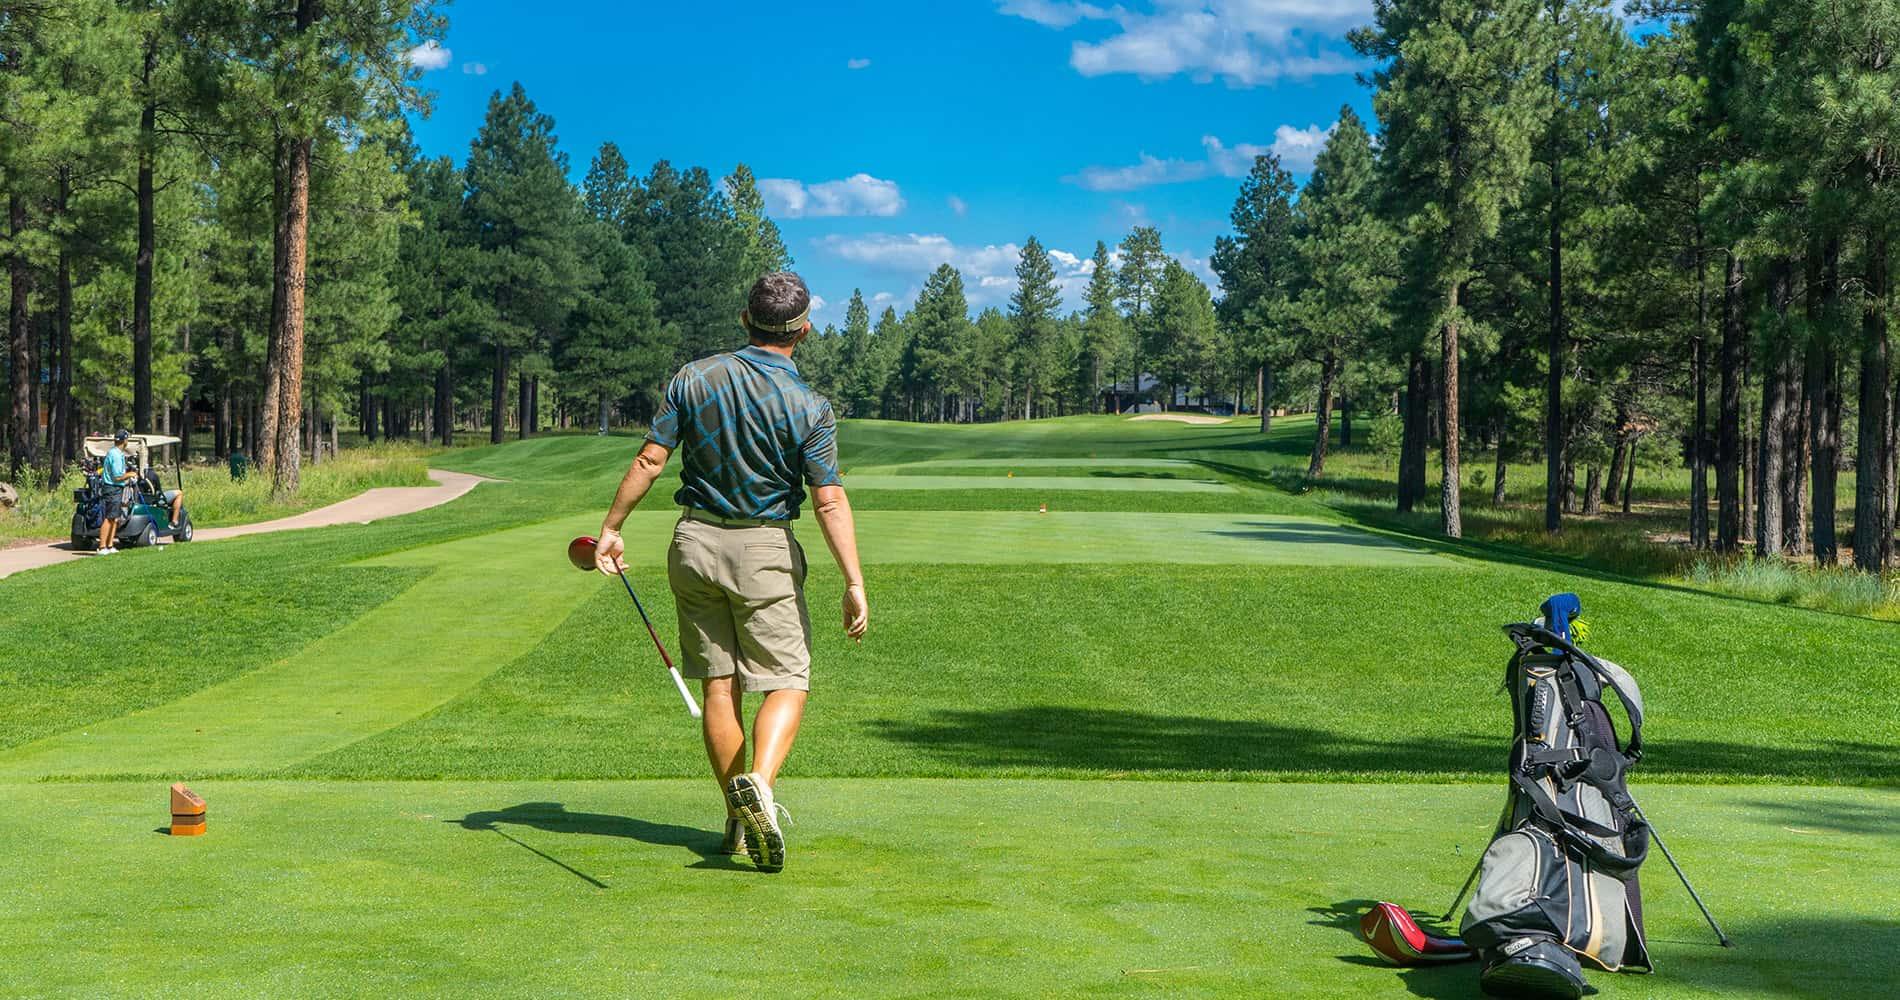 AGI Concepts - Man playing golf